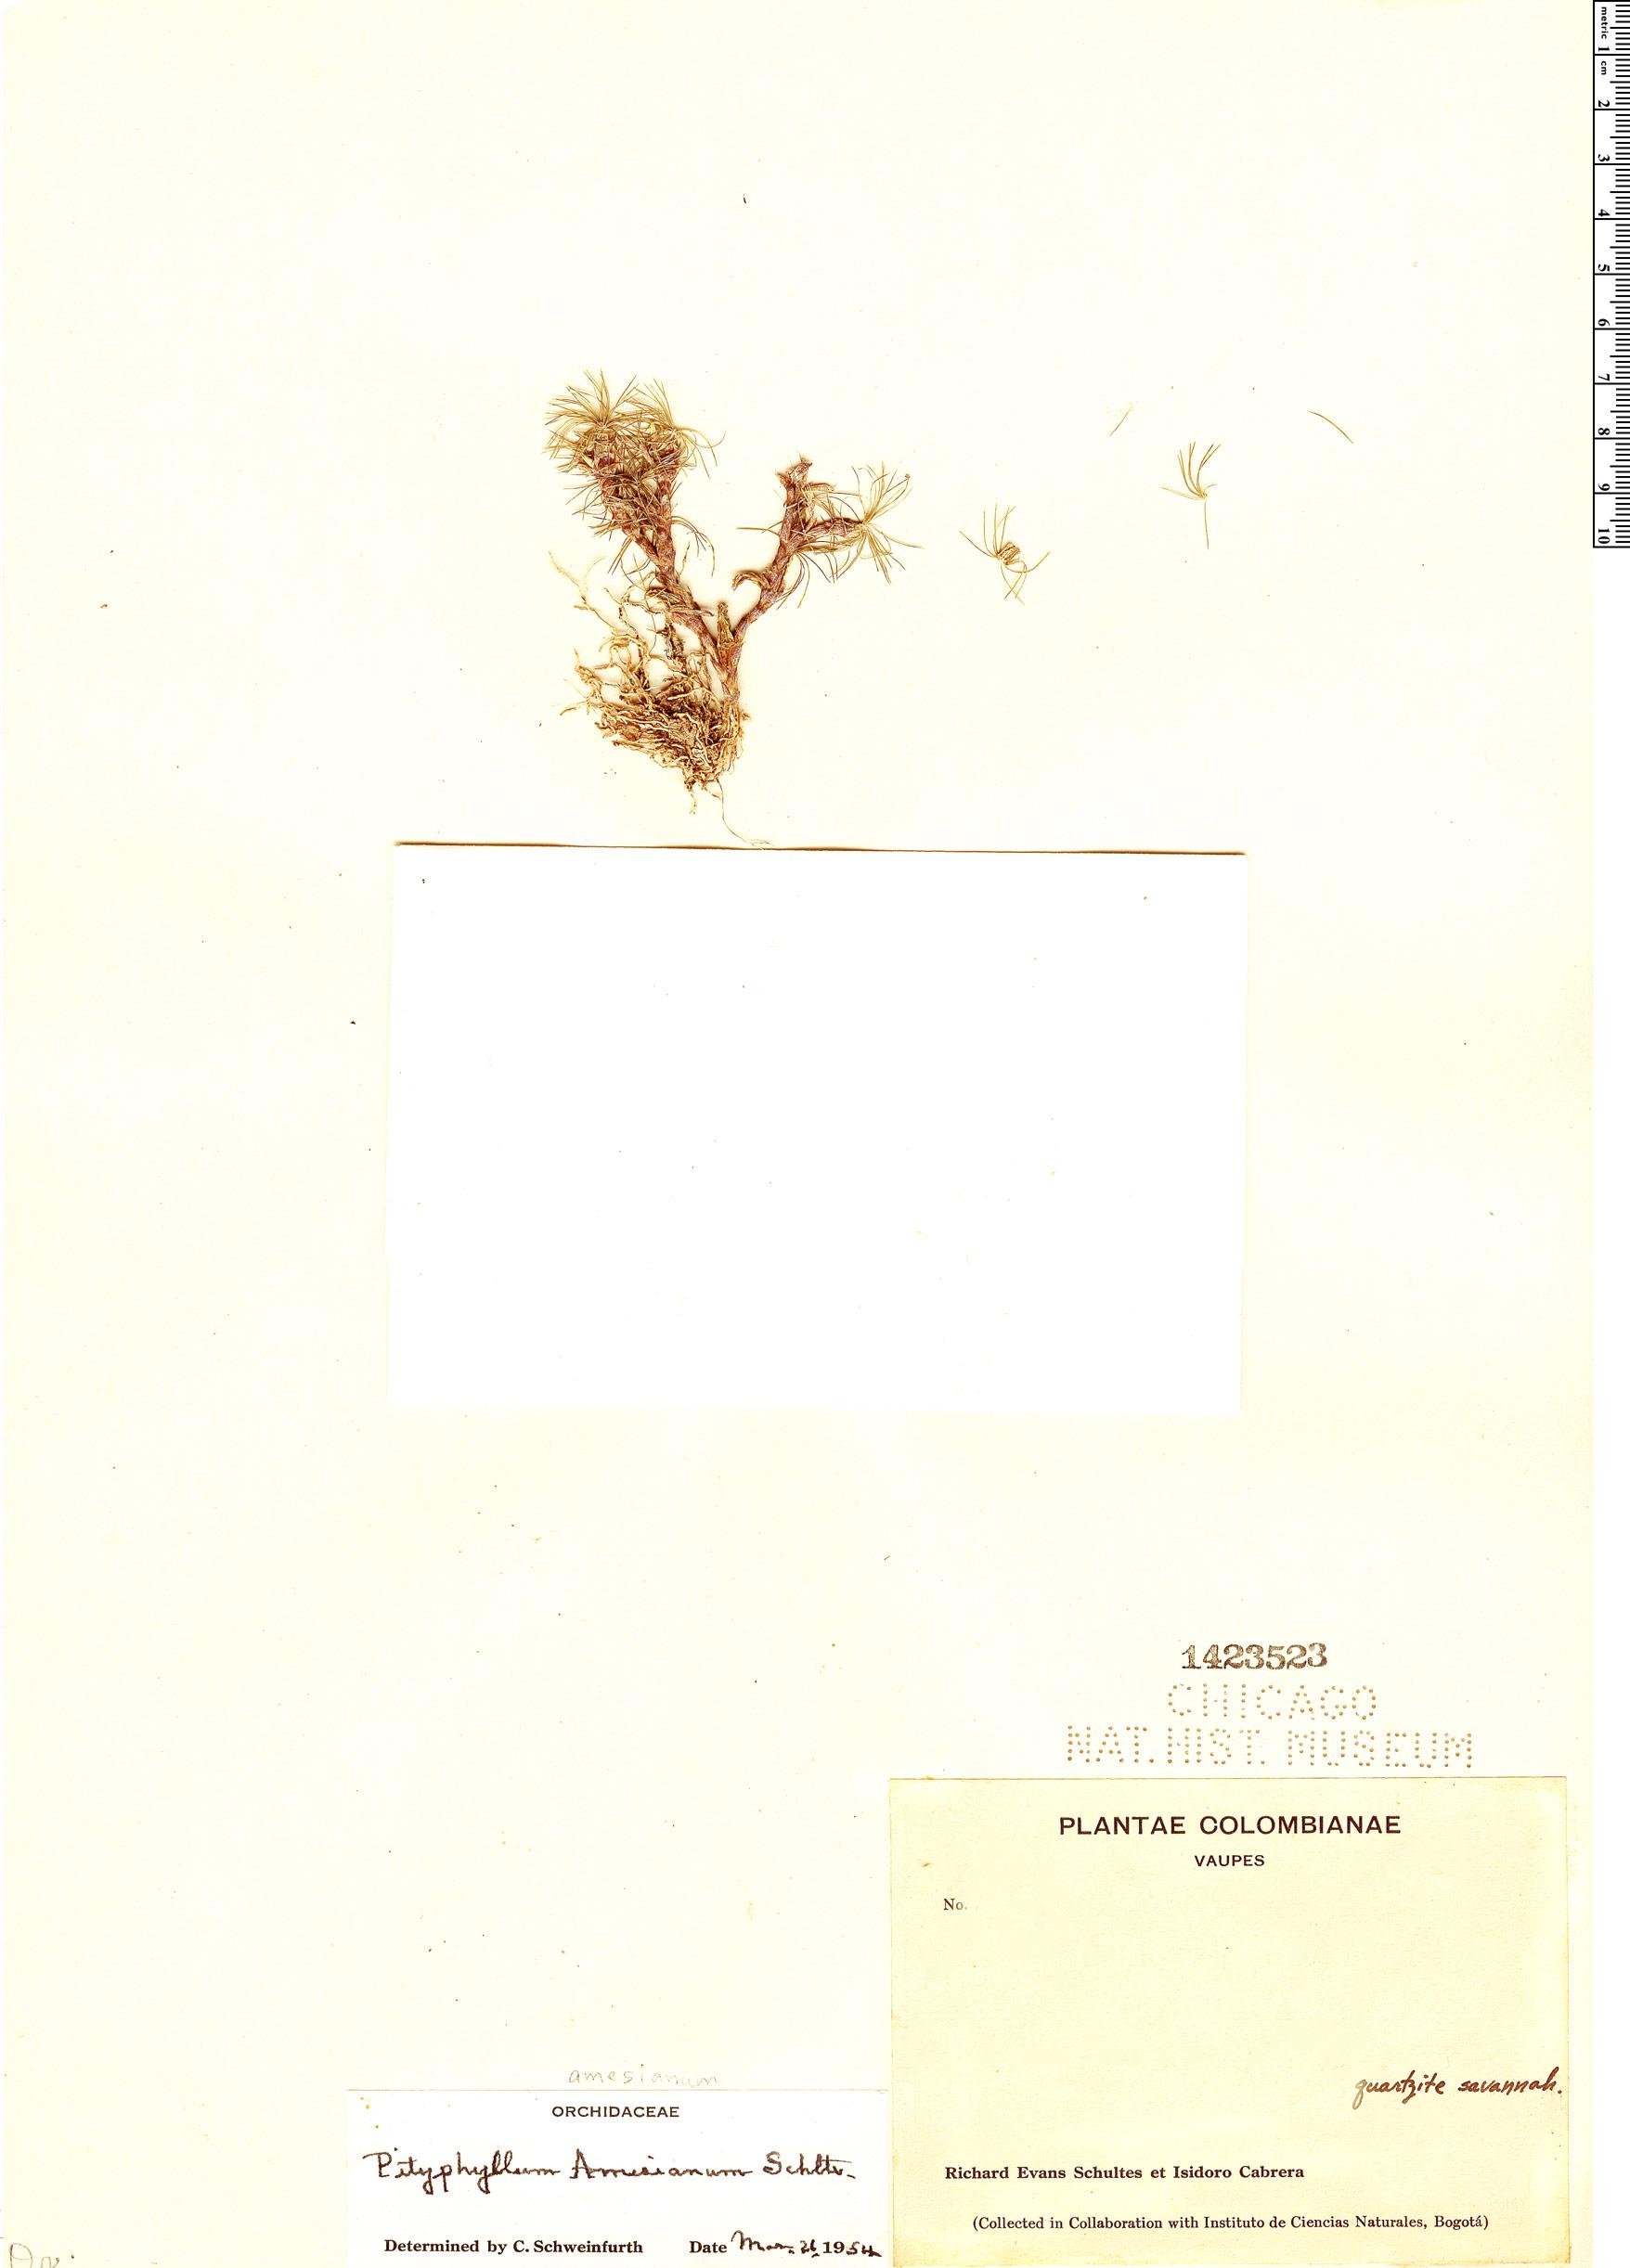 Espécimen: Pityphyllum amesianum